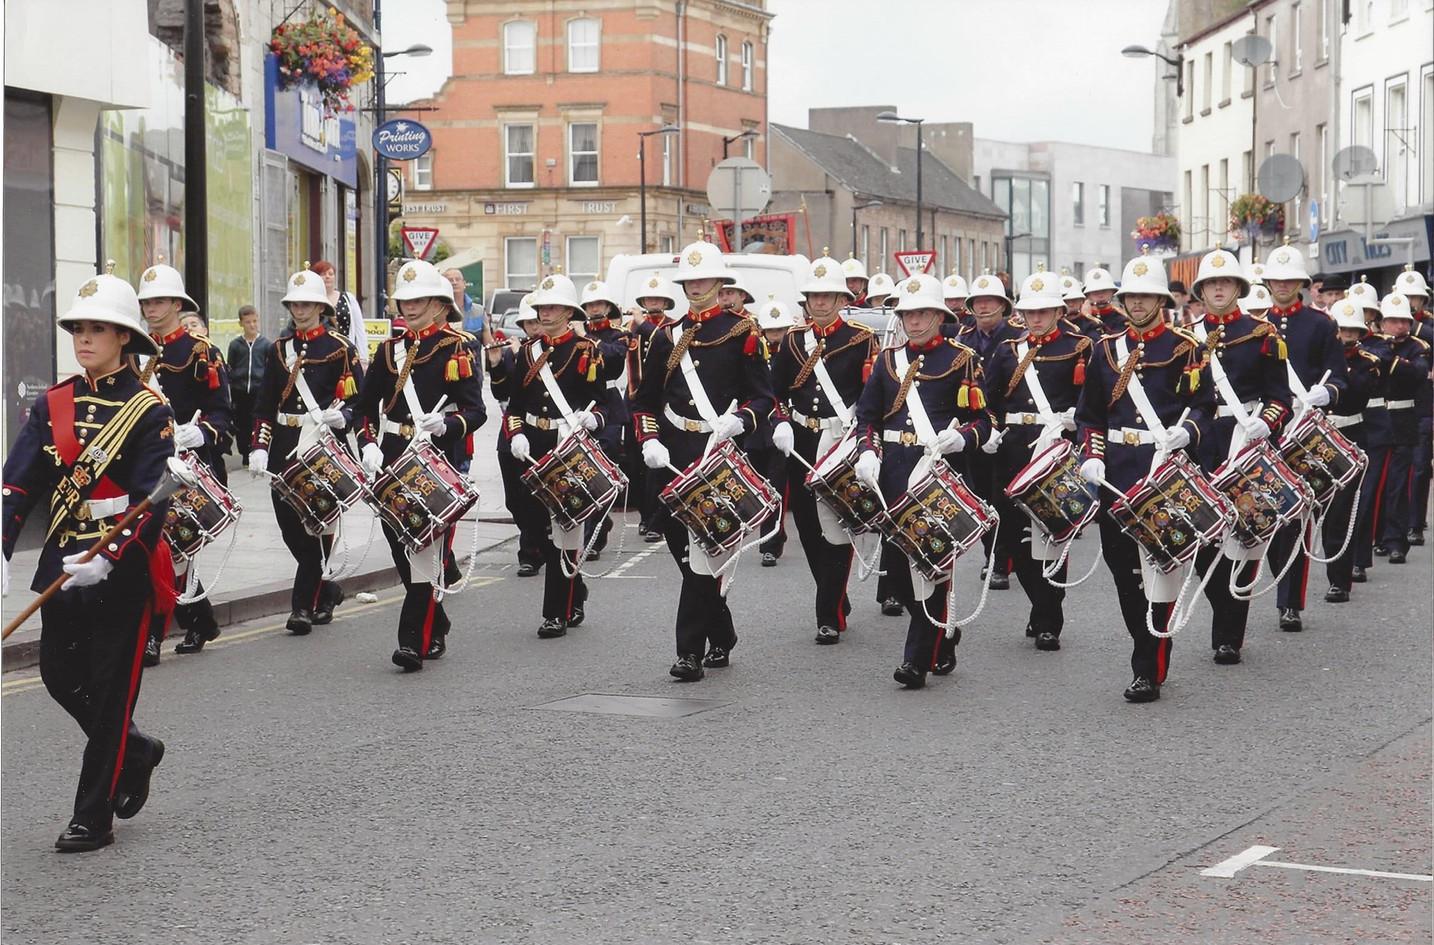 SAD297 OPB on parade in Armagh 2014.jpg